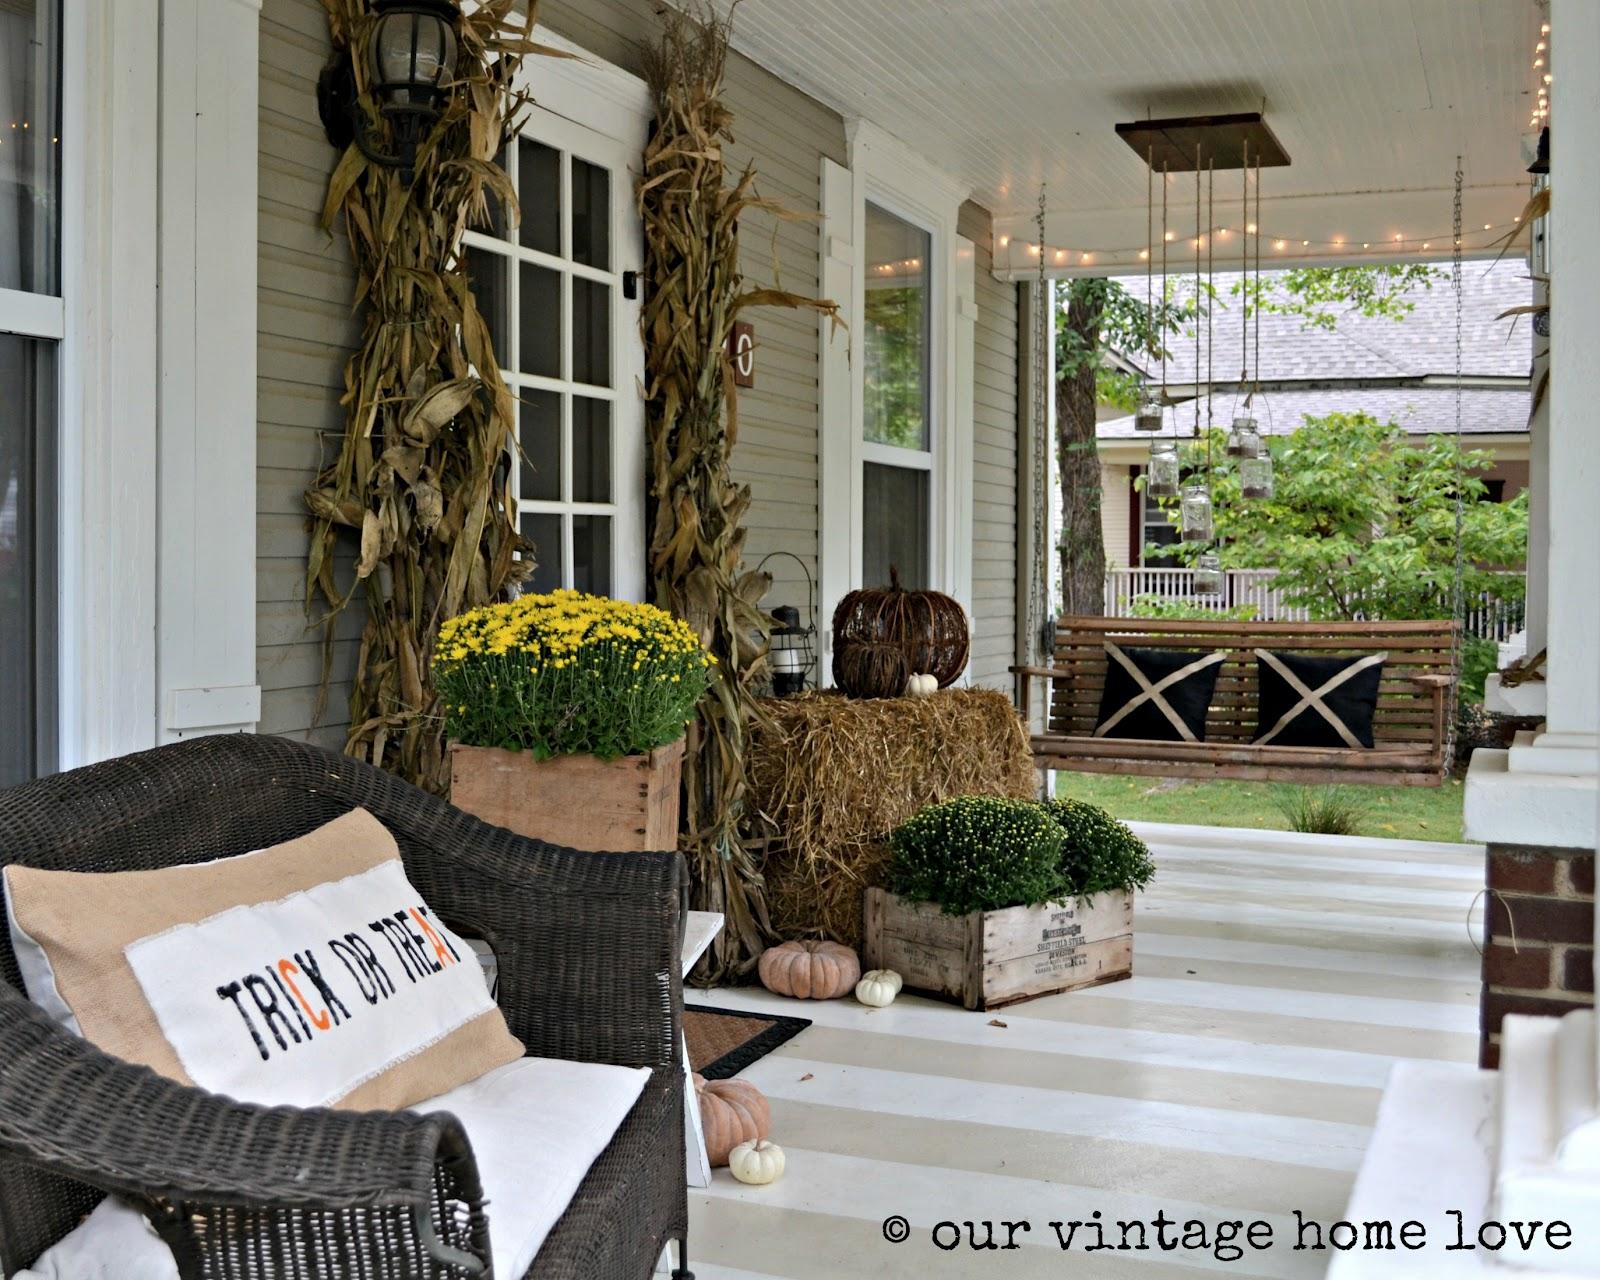 Apartment Porch Ideas: Small condo patio design inspiration ...